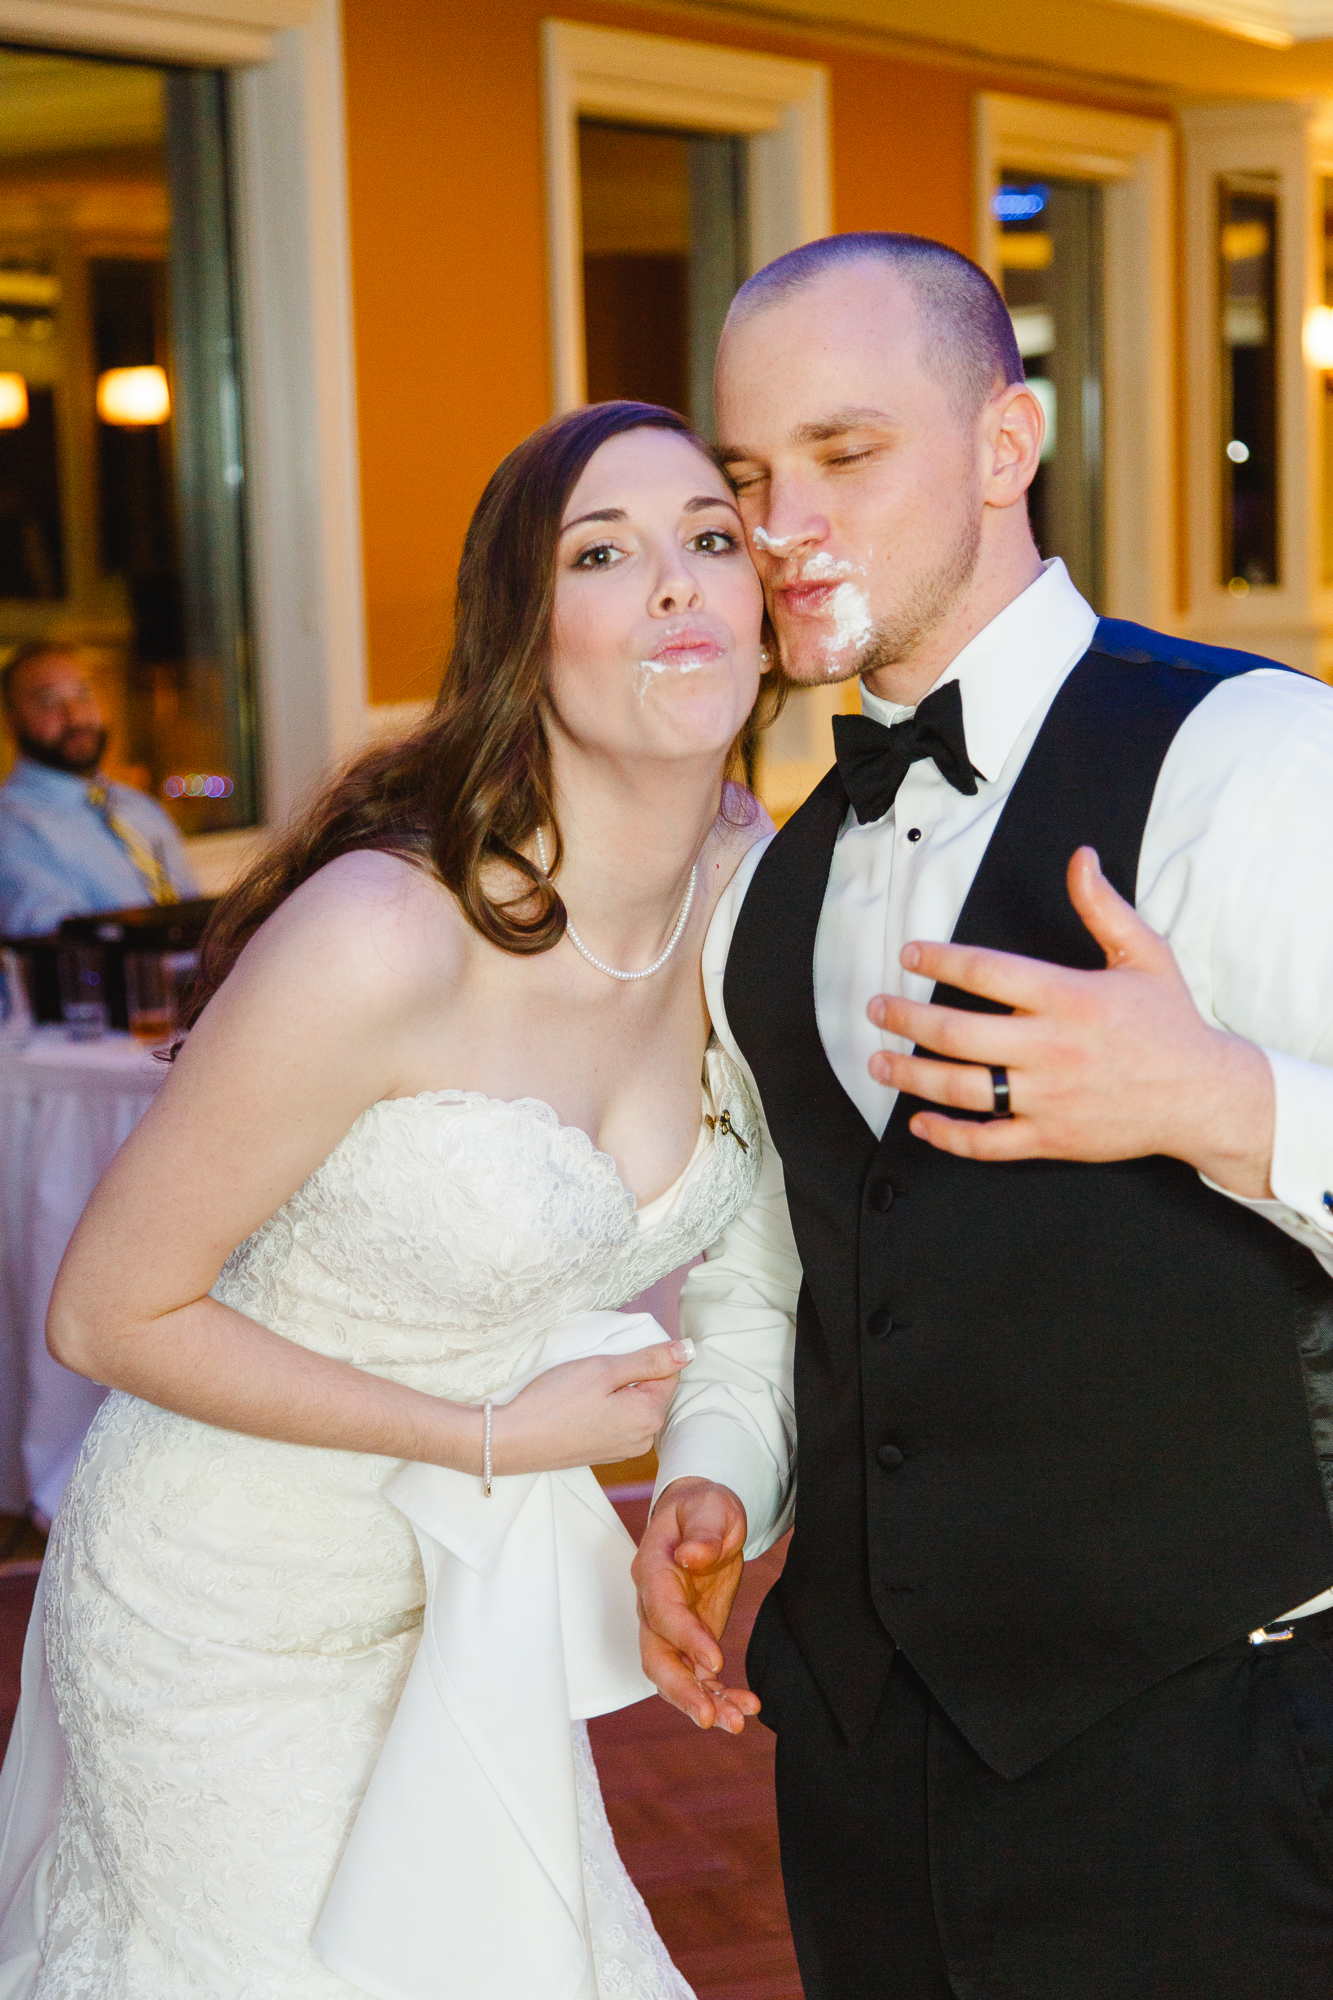 brady-reception-ceremony-a-ohio-lighting-ocf-columbus-wedding-couple-bridal-creekside-conference-indoor-roxanna-sue-photos-ohio-photography-1.jpg